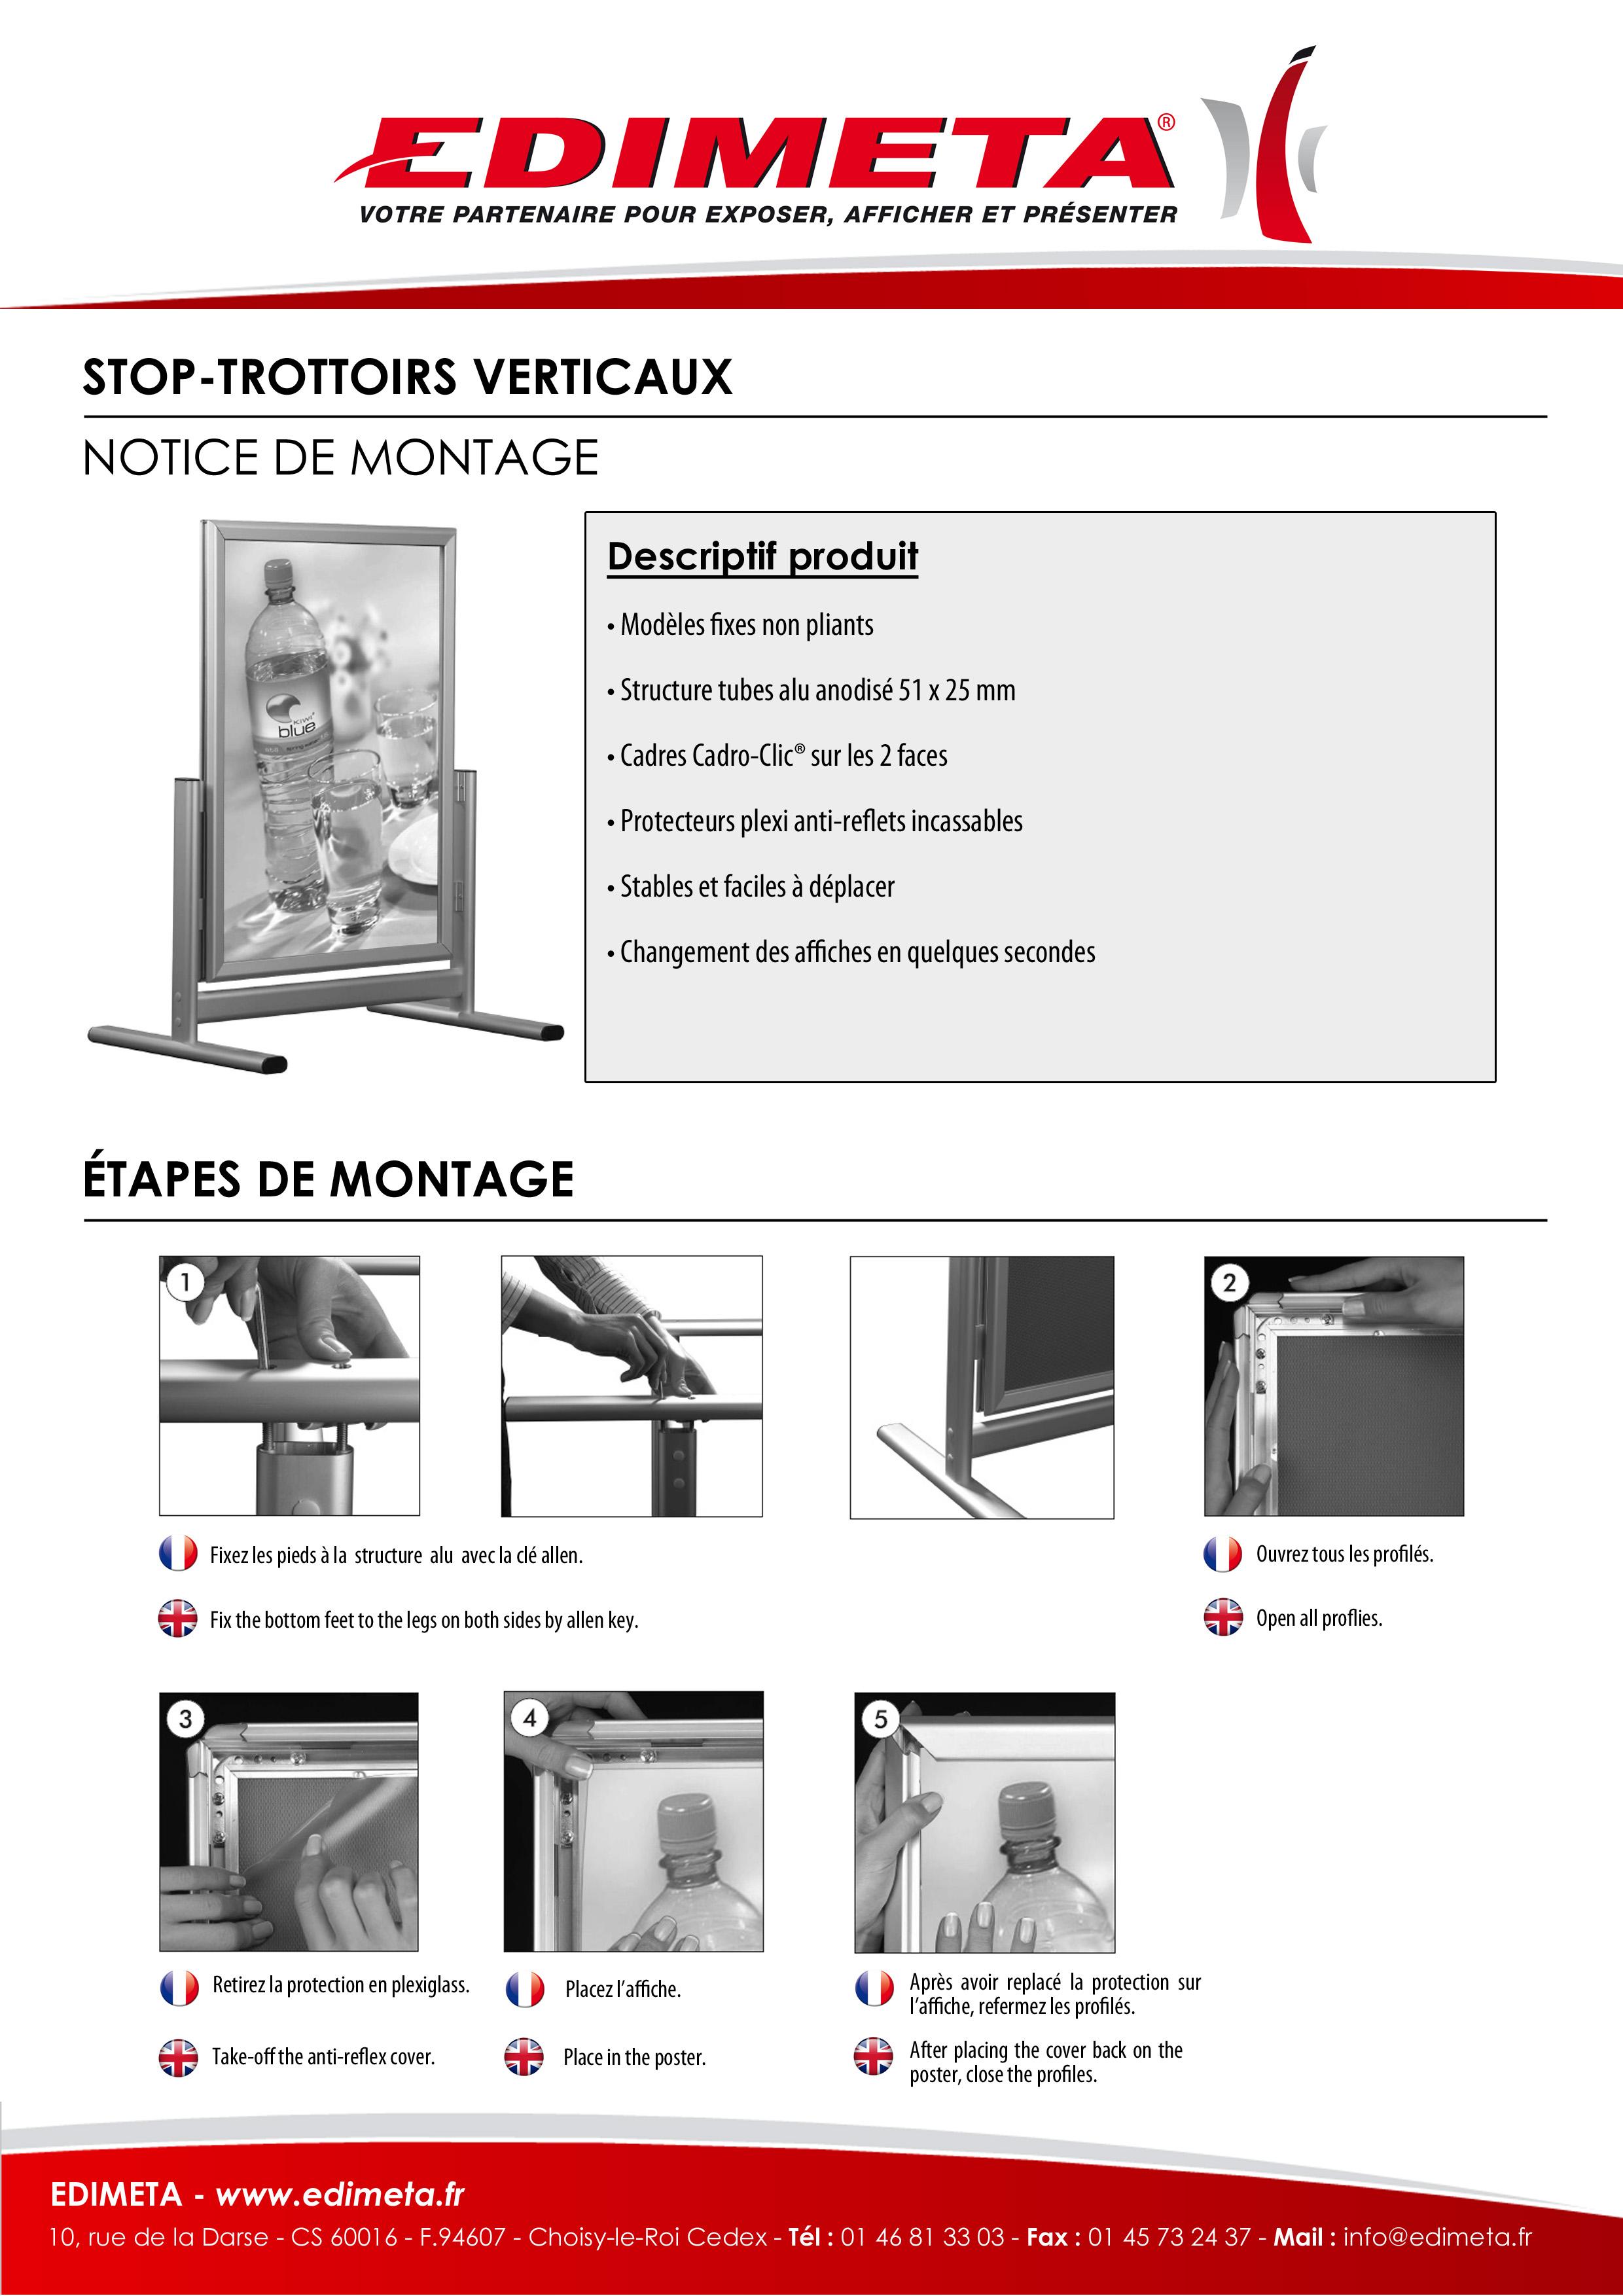 NOTICE DE MONTAGE : STOP-TROTTOIRS VERTICAUX CADRO-CLIC®